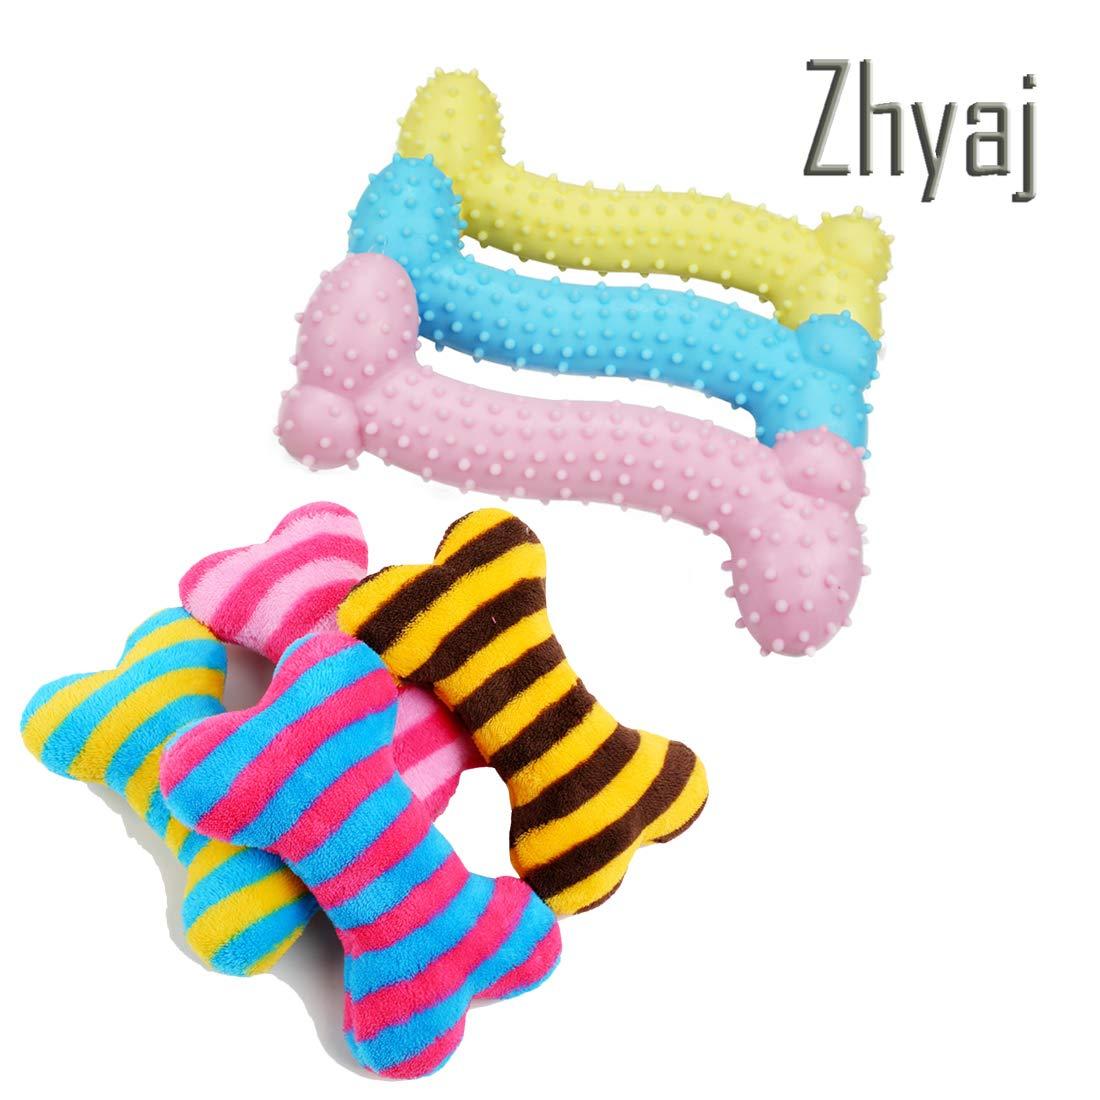 7PCS Dog Toys Plush Bone Pet Toy Dog Molar Vocal Toy Macaron Bone Durable And Bite Resistant Clean Tooth Bone Cat Toys,7PCS